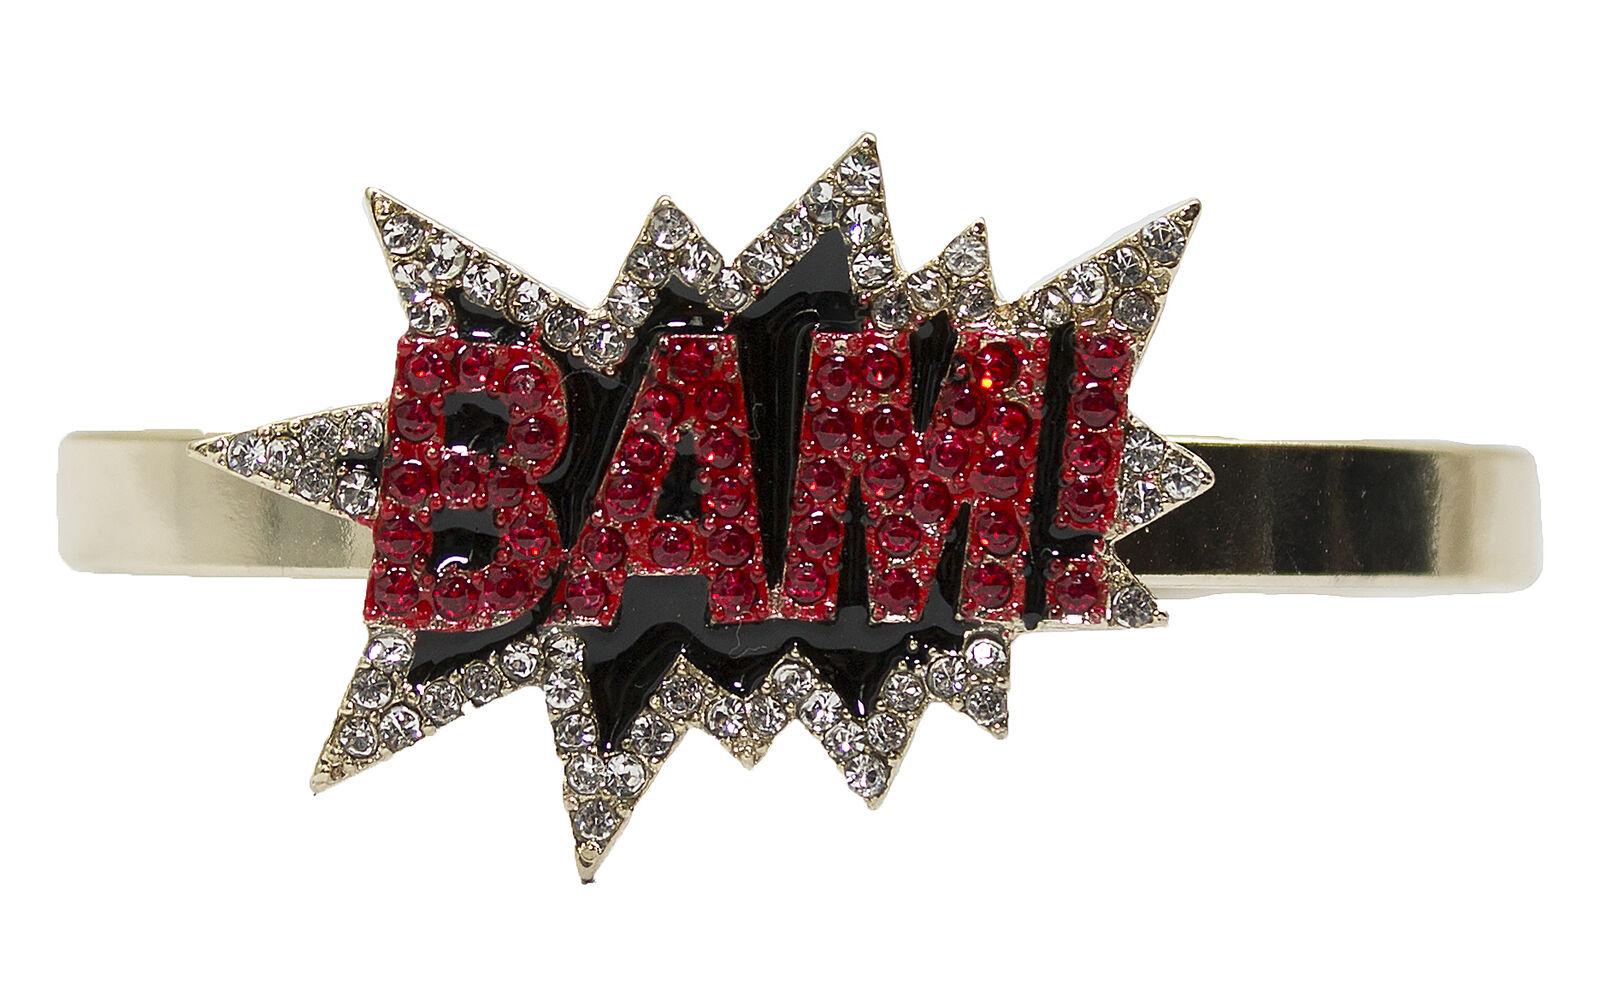 Pop Art Bangle Bracelet with Rhinestones and Enamel